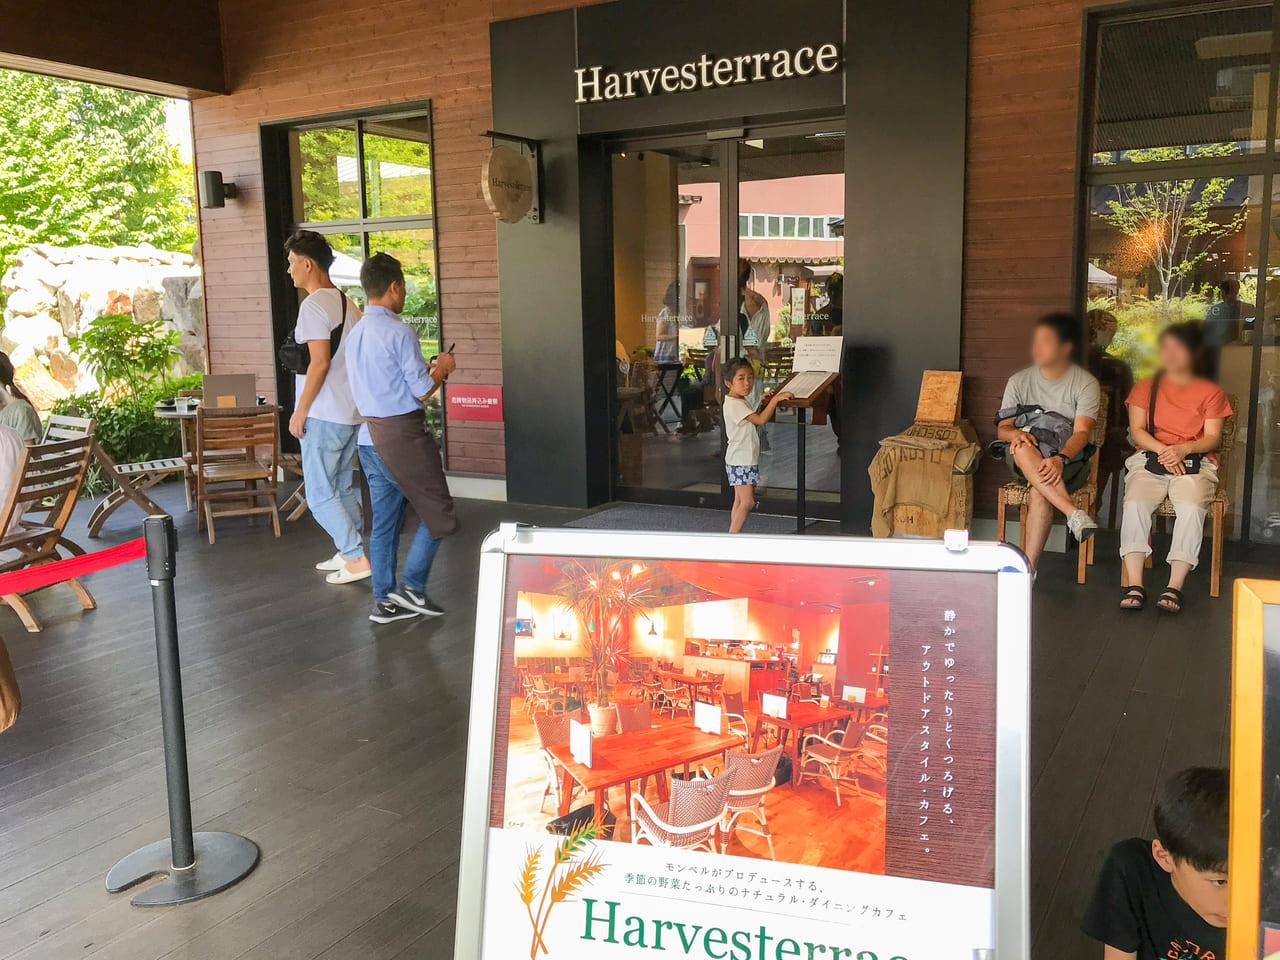 /Harvesterrace昭島アウトドアヴィレッジ店外観